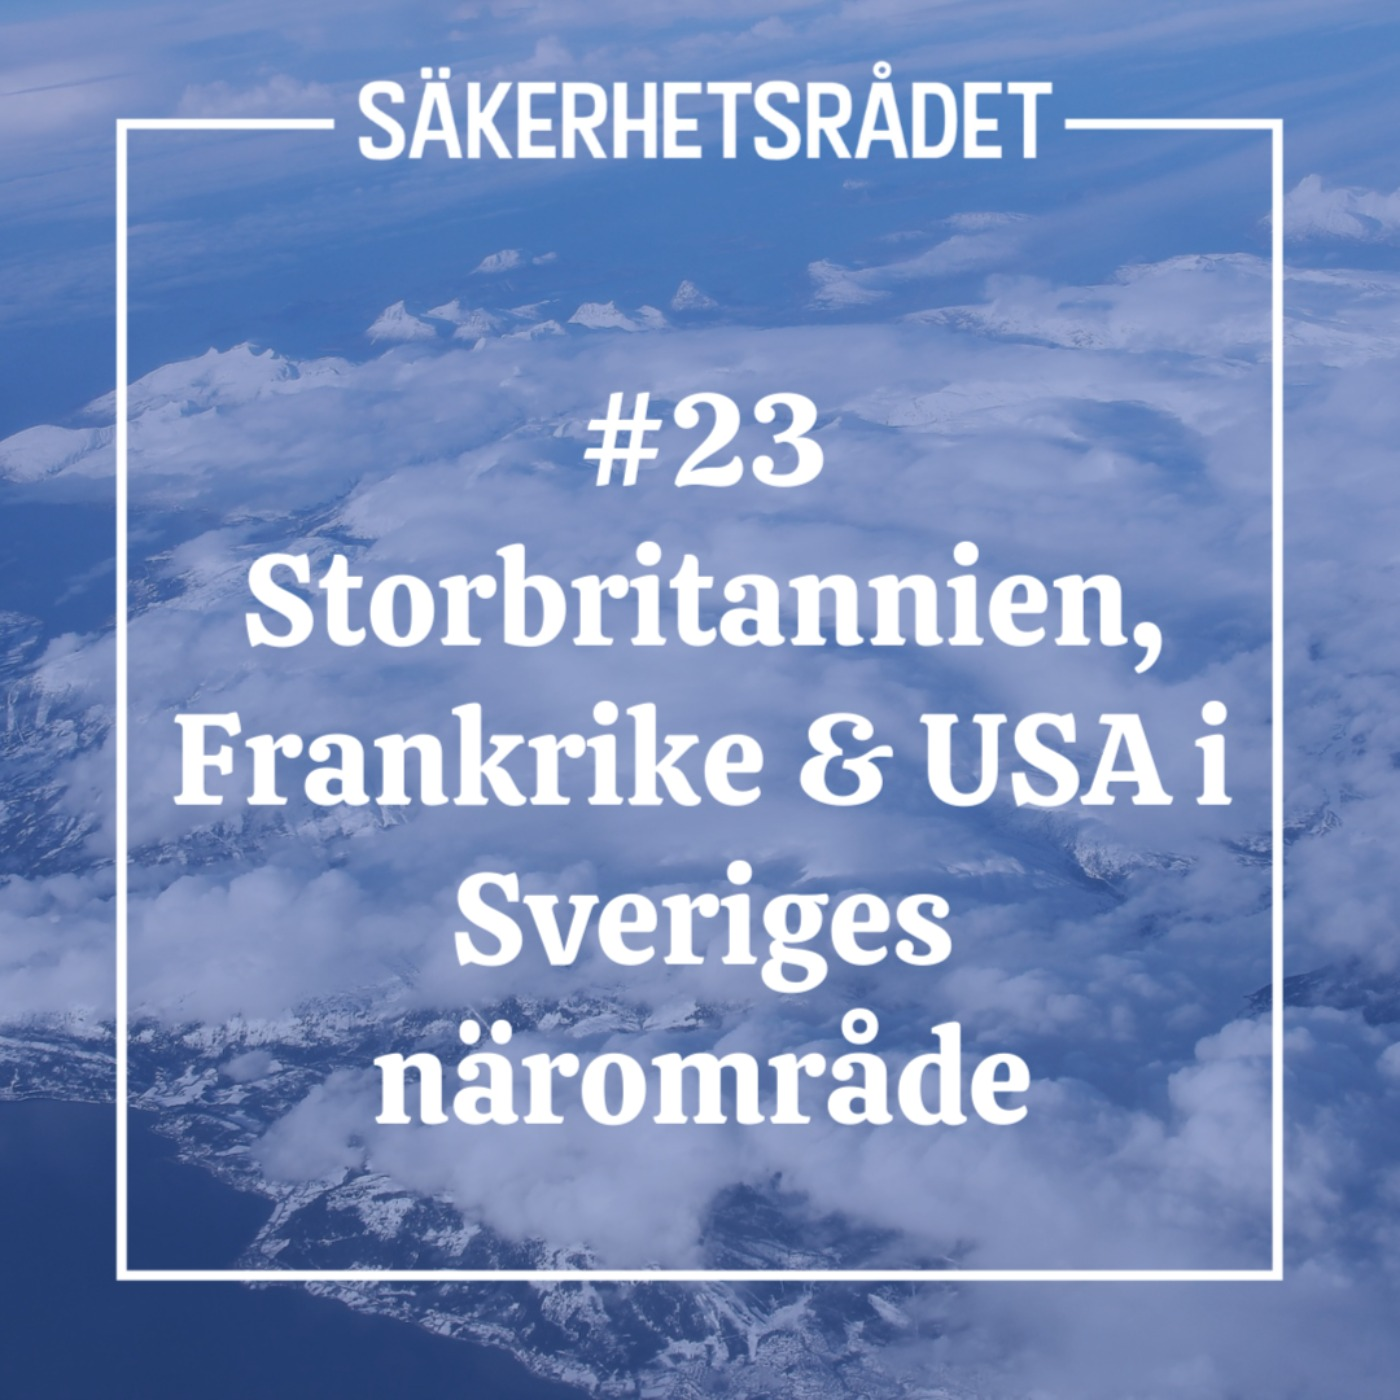 Storbritannien, Frankrike & USA i Sveriges närområde